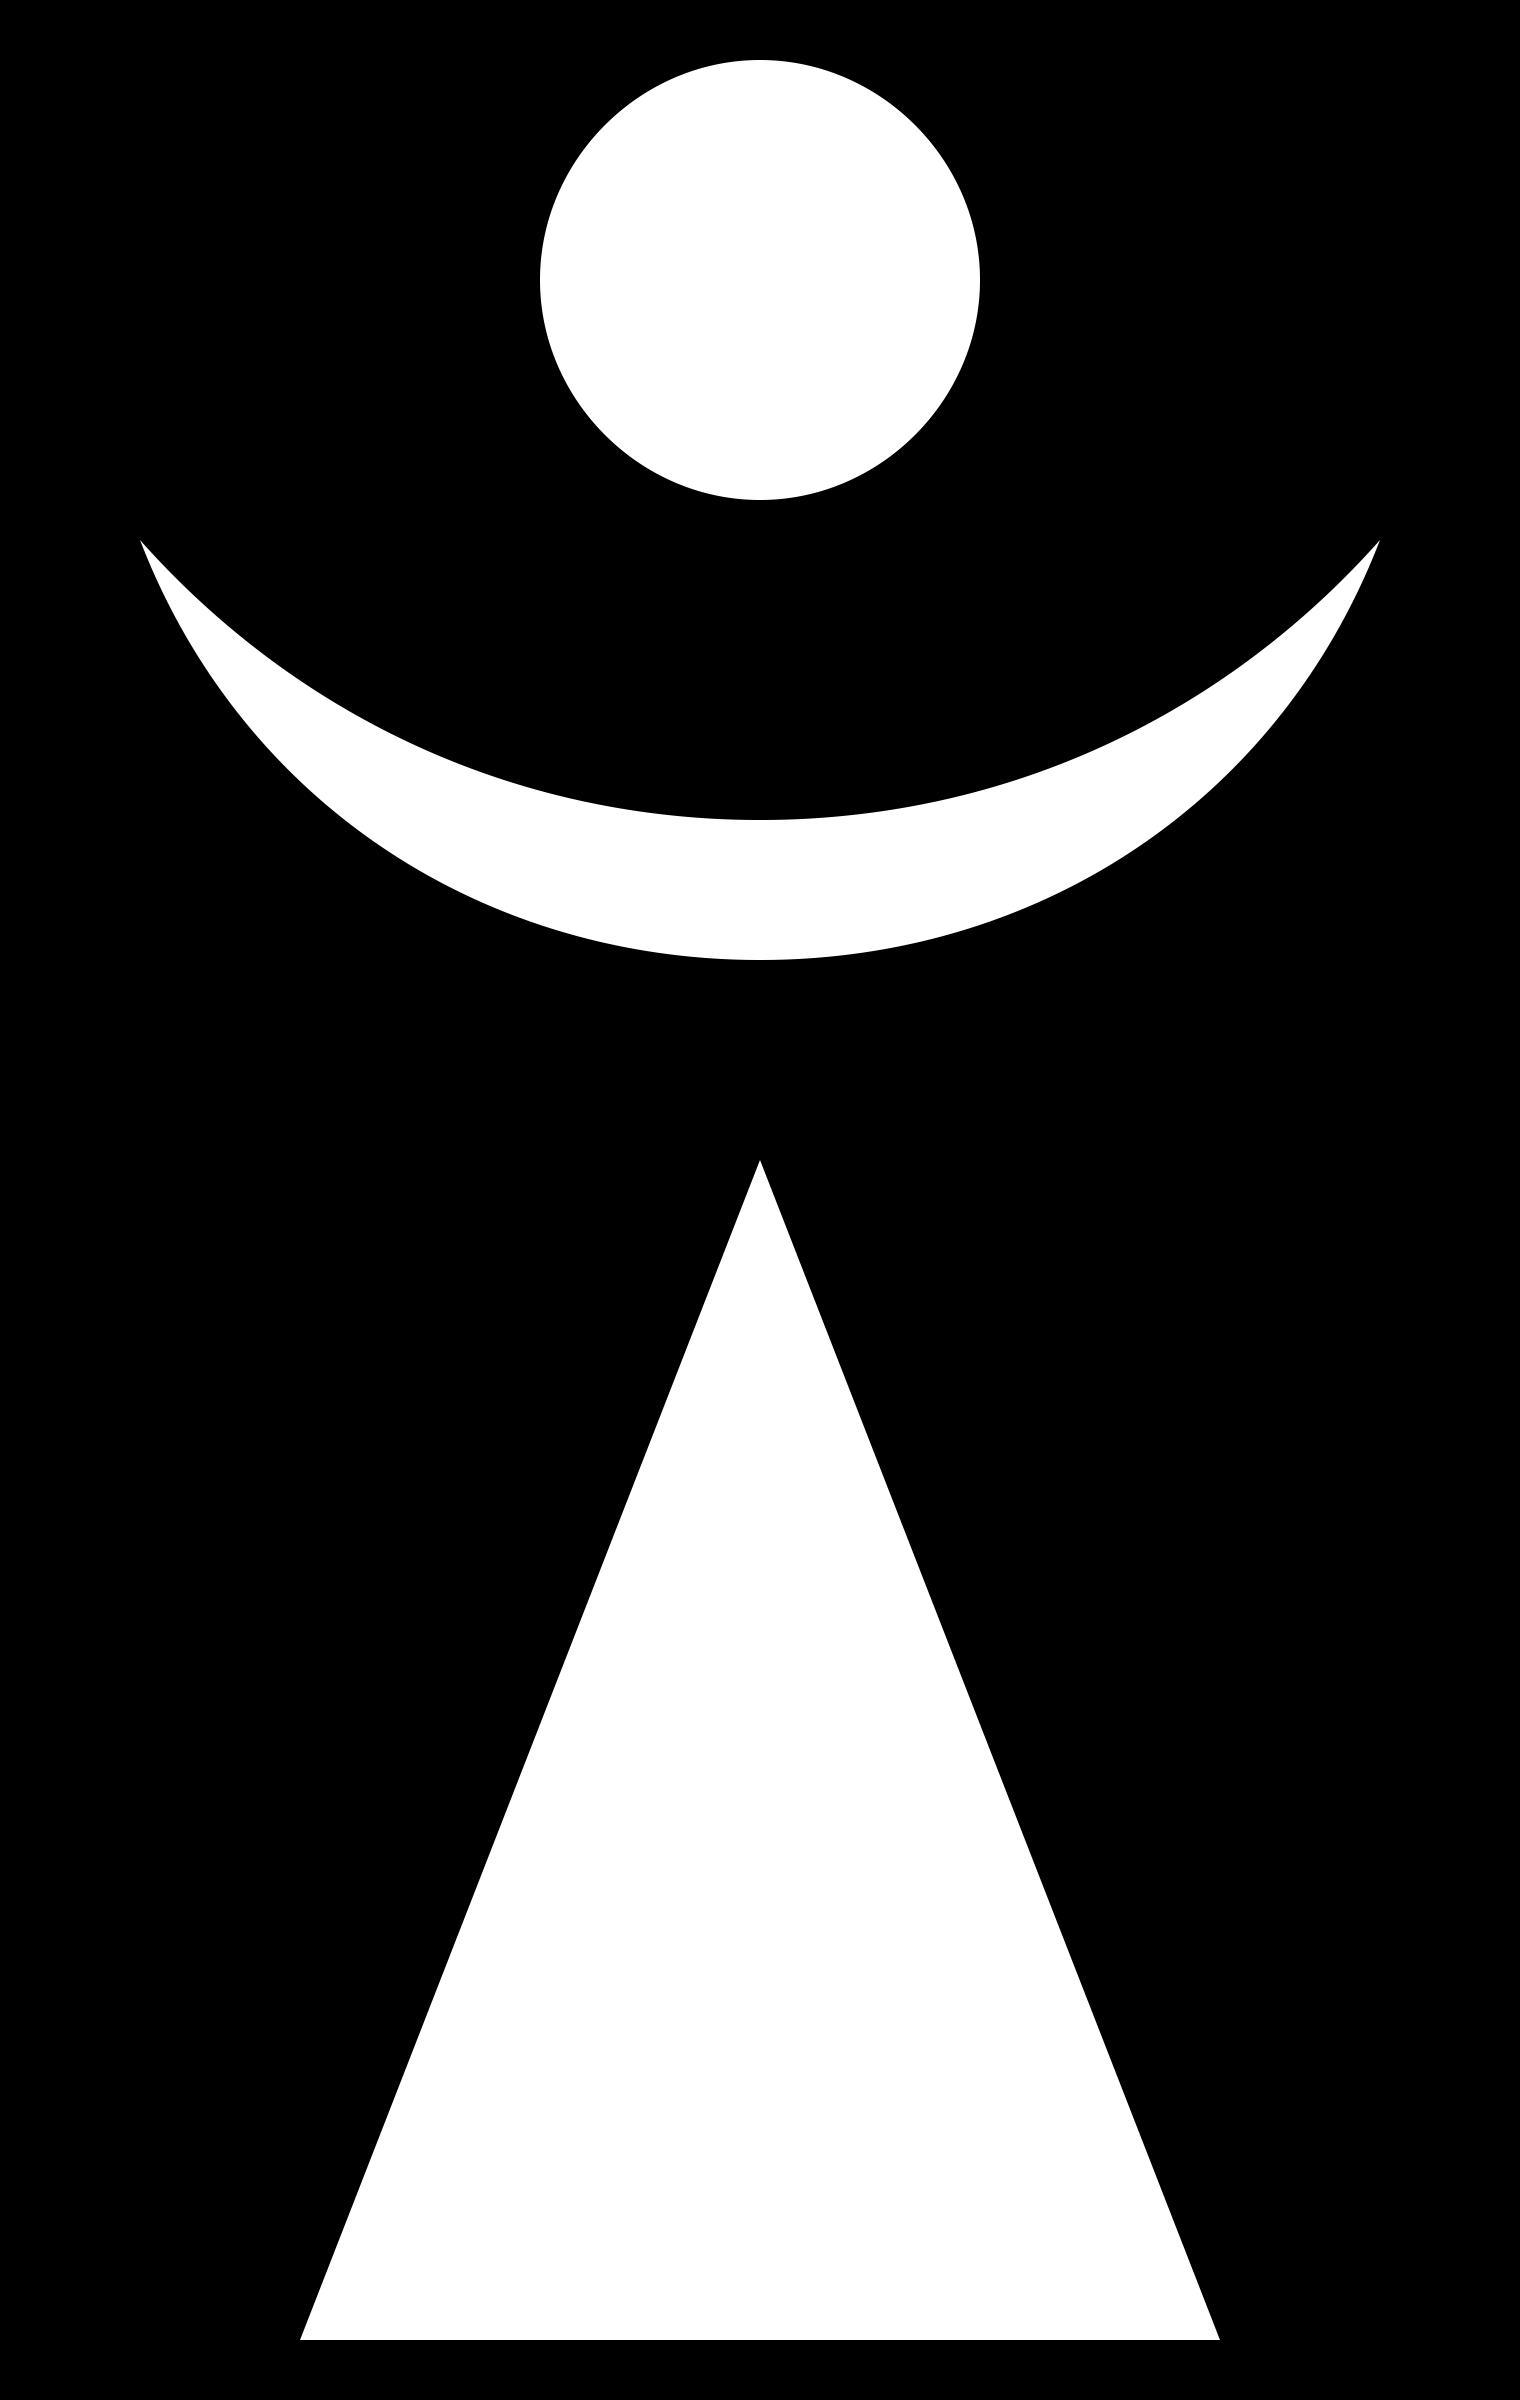 Clipart egpyt crown clip art black and white download Clipart - Ancient Sacred Symbol clip art black and white download